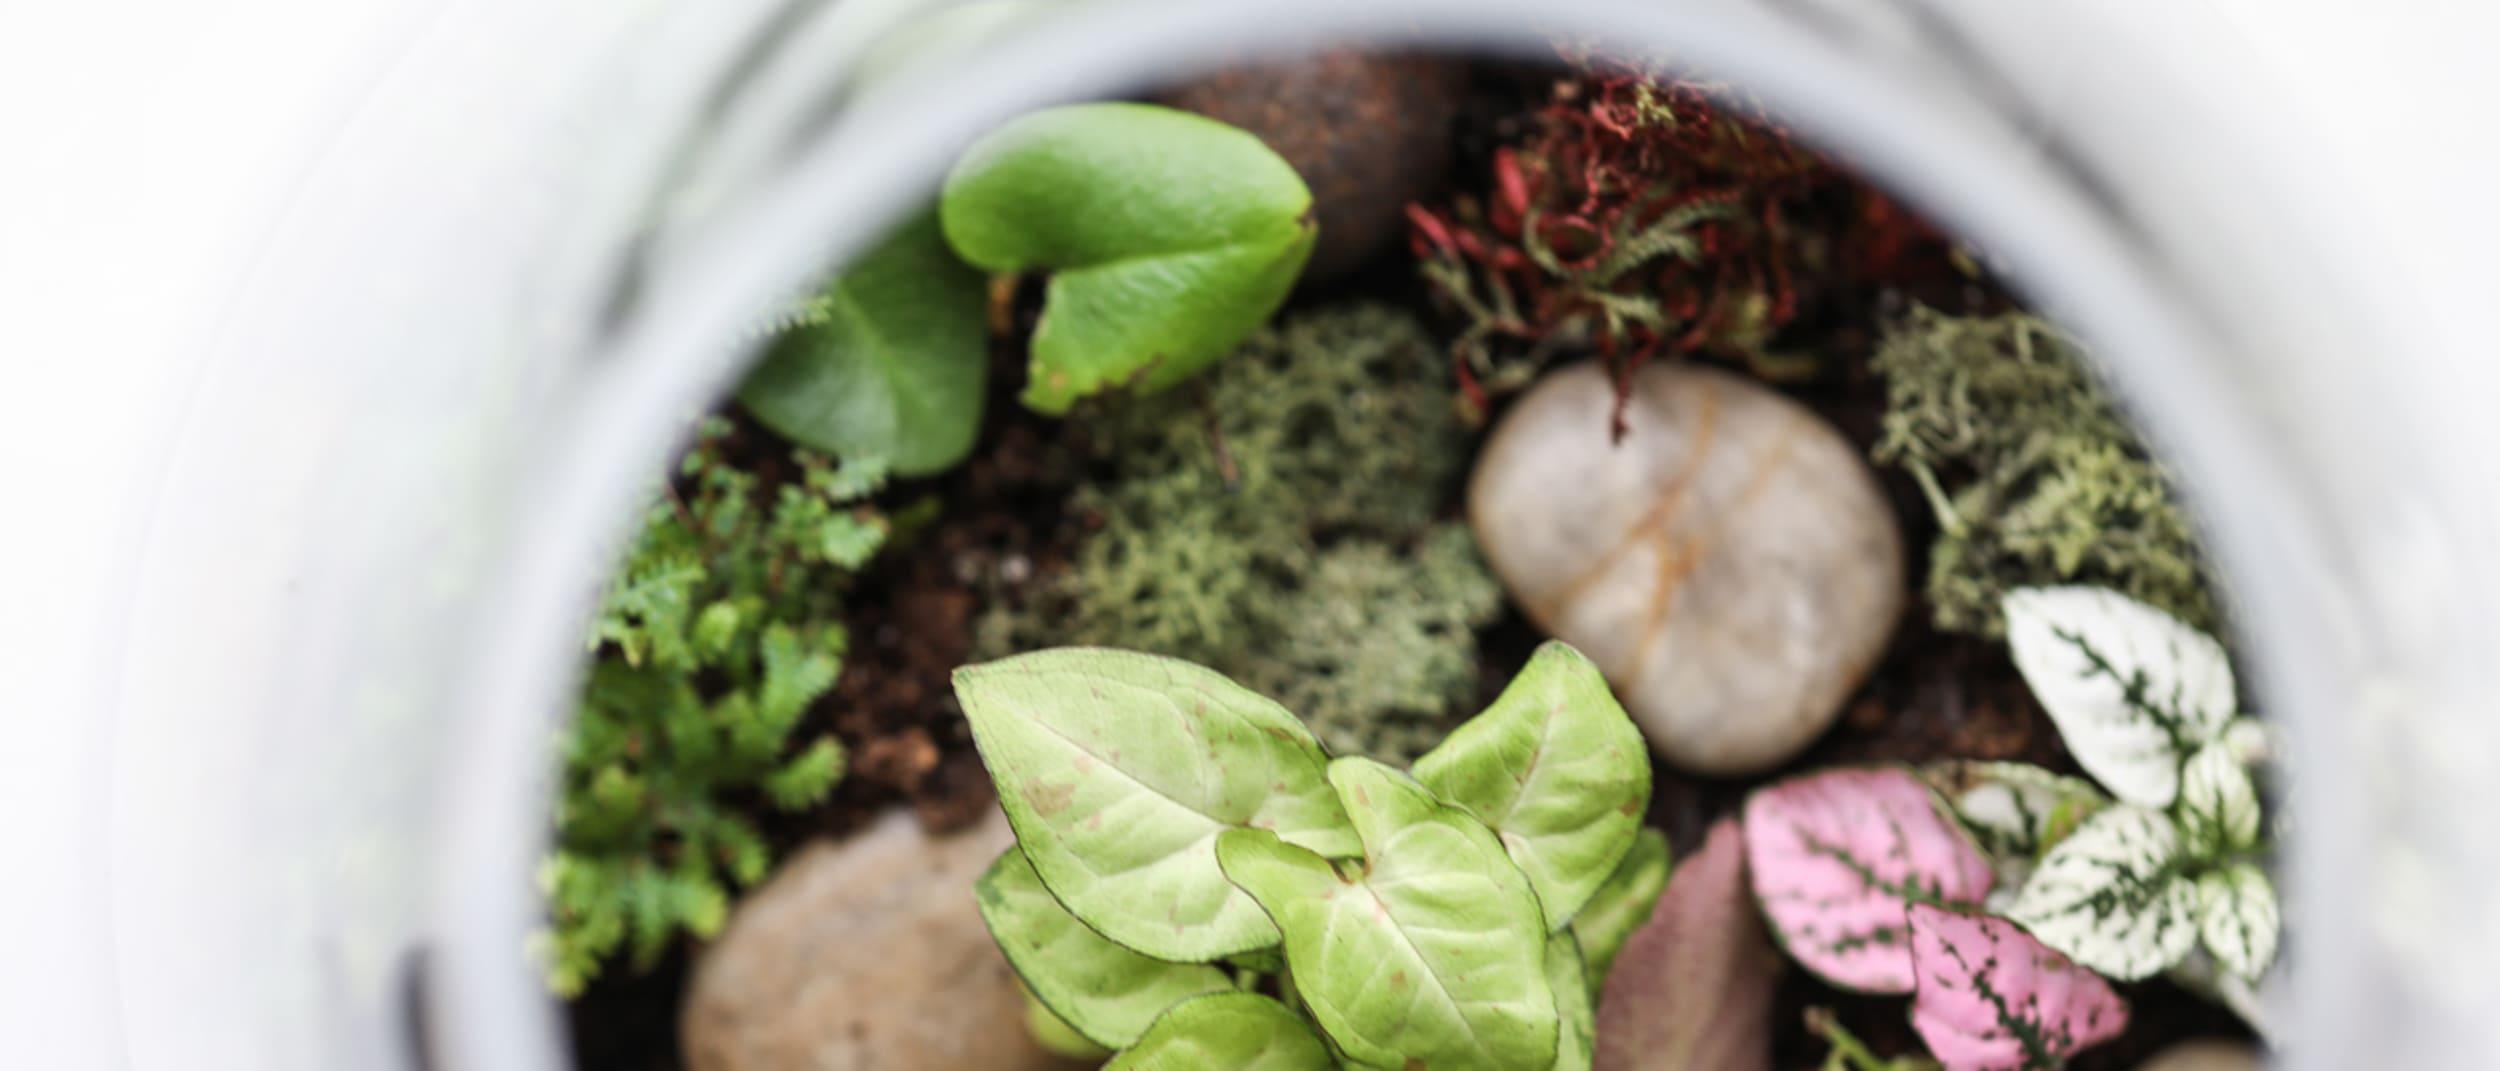 Gro Urban Oasis talk terrariums